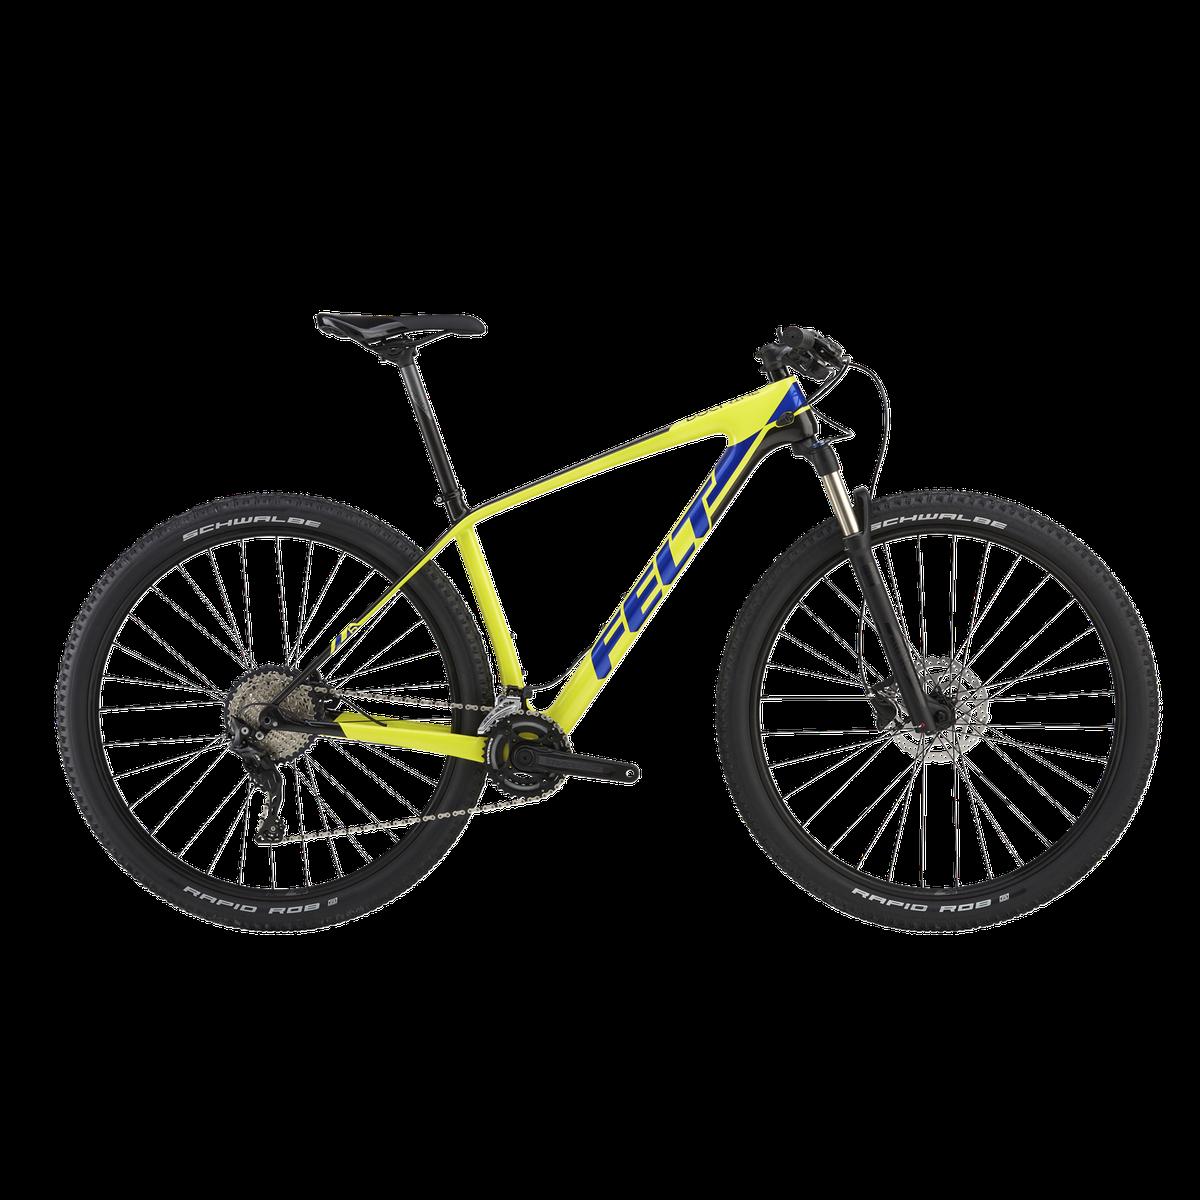 Doctrine 6 XT 18, mountainbike, unisex | MTB